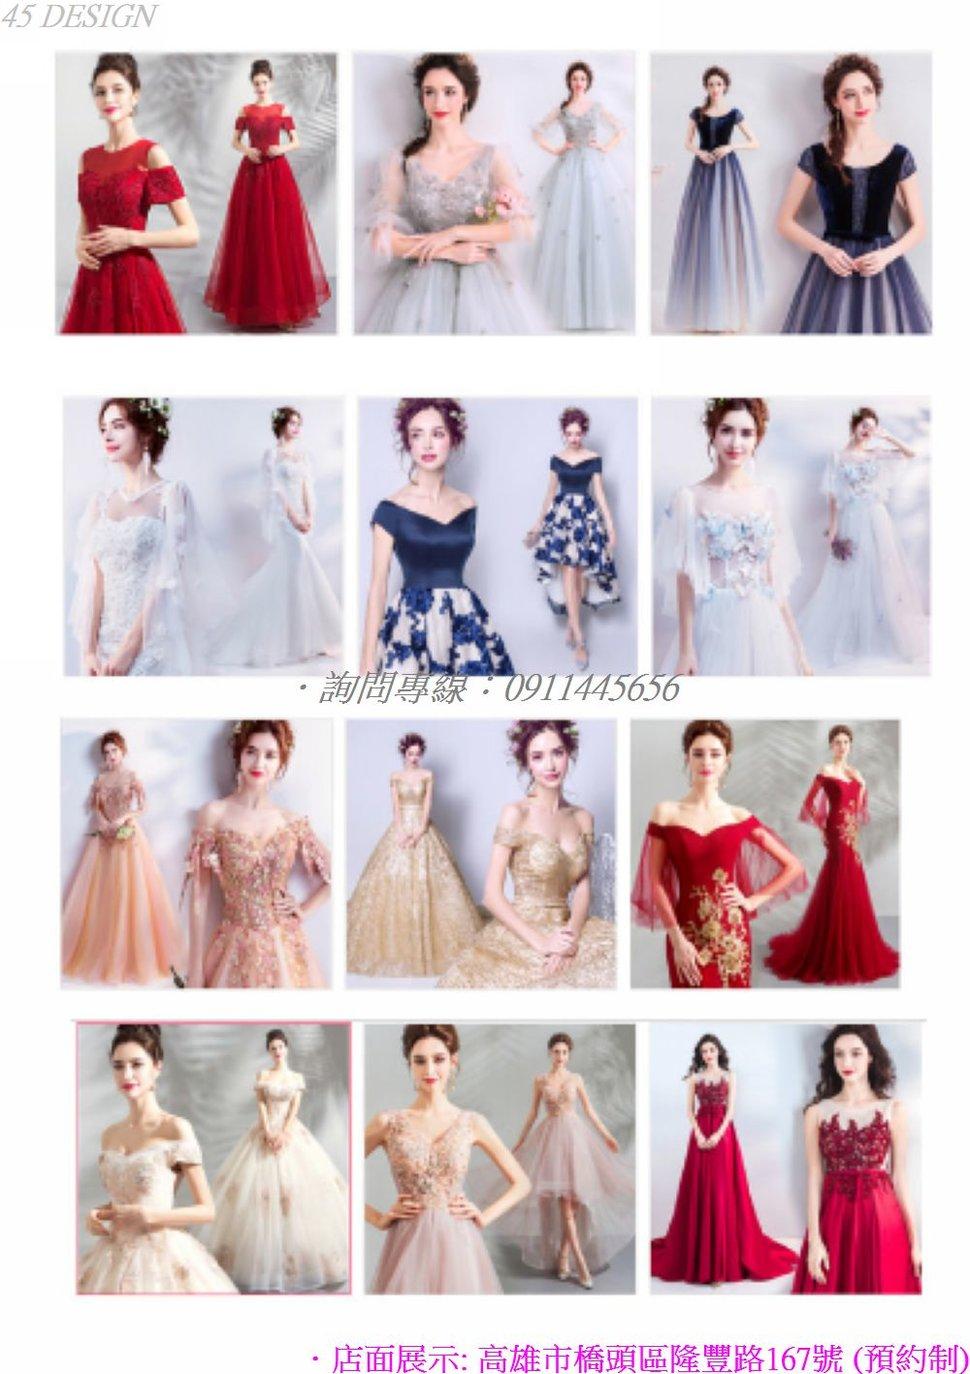 msl190815FCFFD45100984B7483DB8E0CDF4FA8C5 - 全台最便宜-45DESIGN四五婚紗禮服《結婚吧》